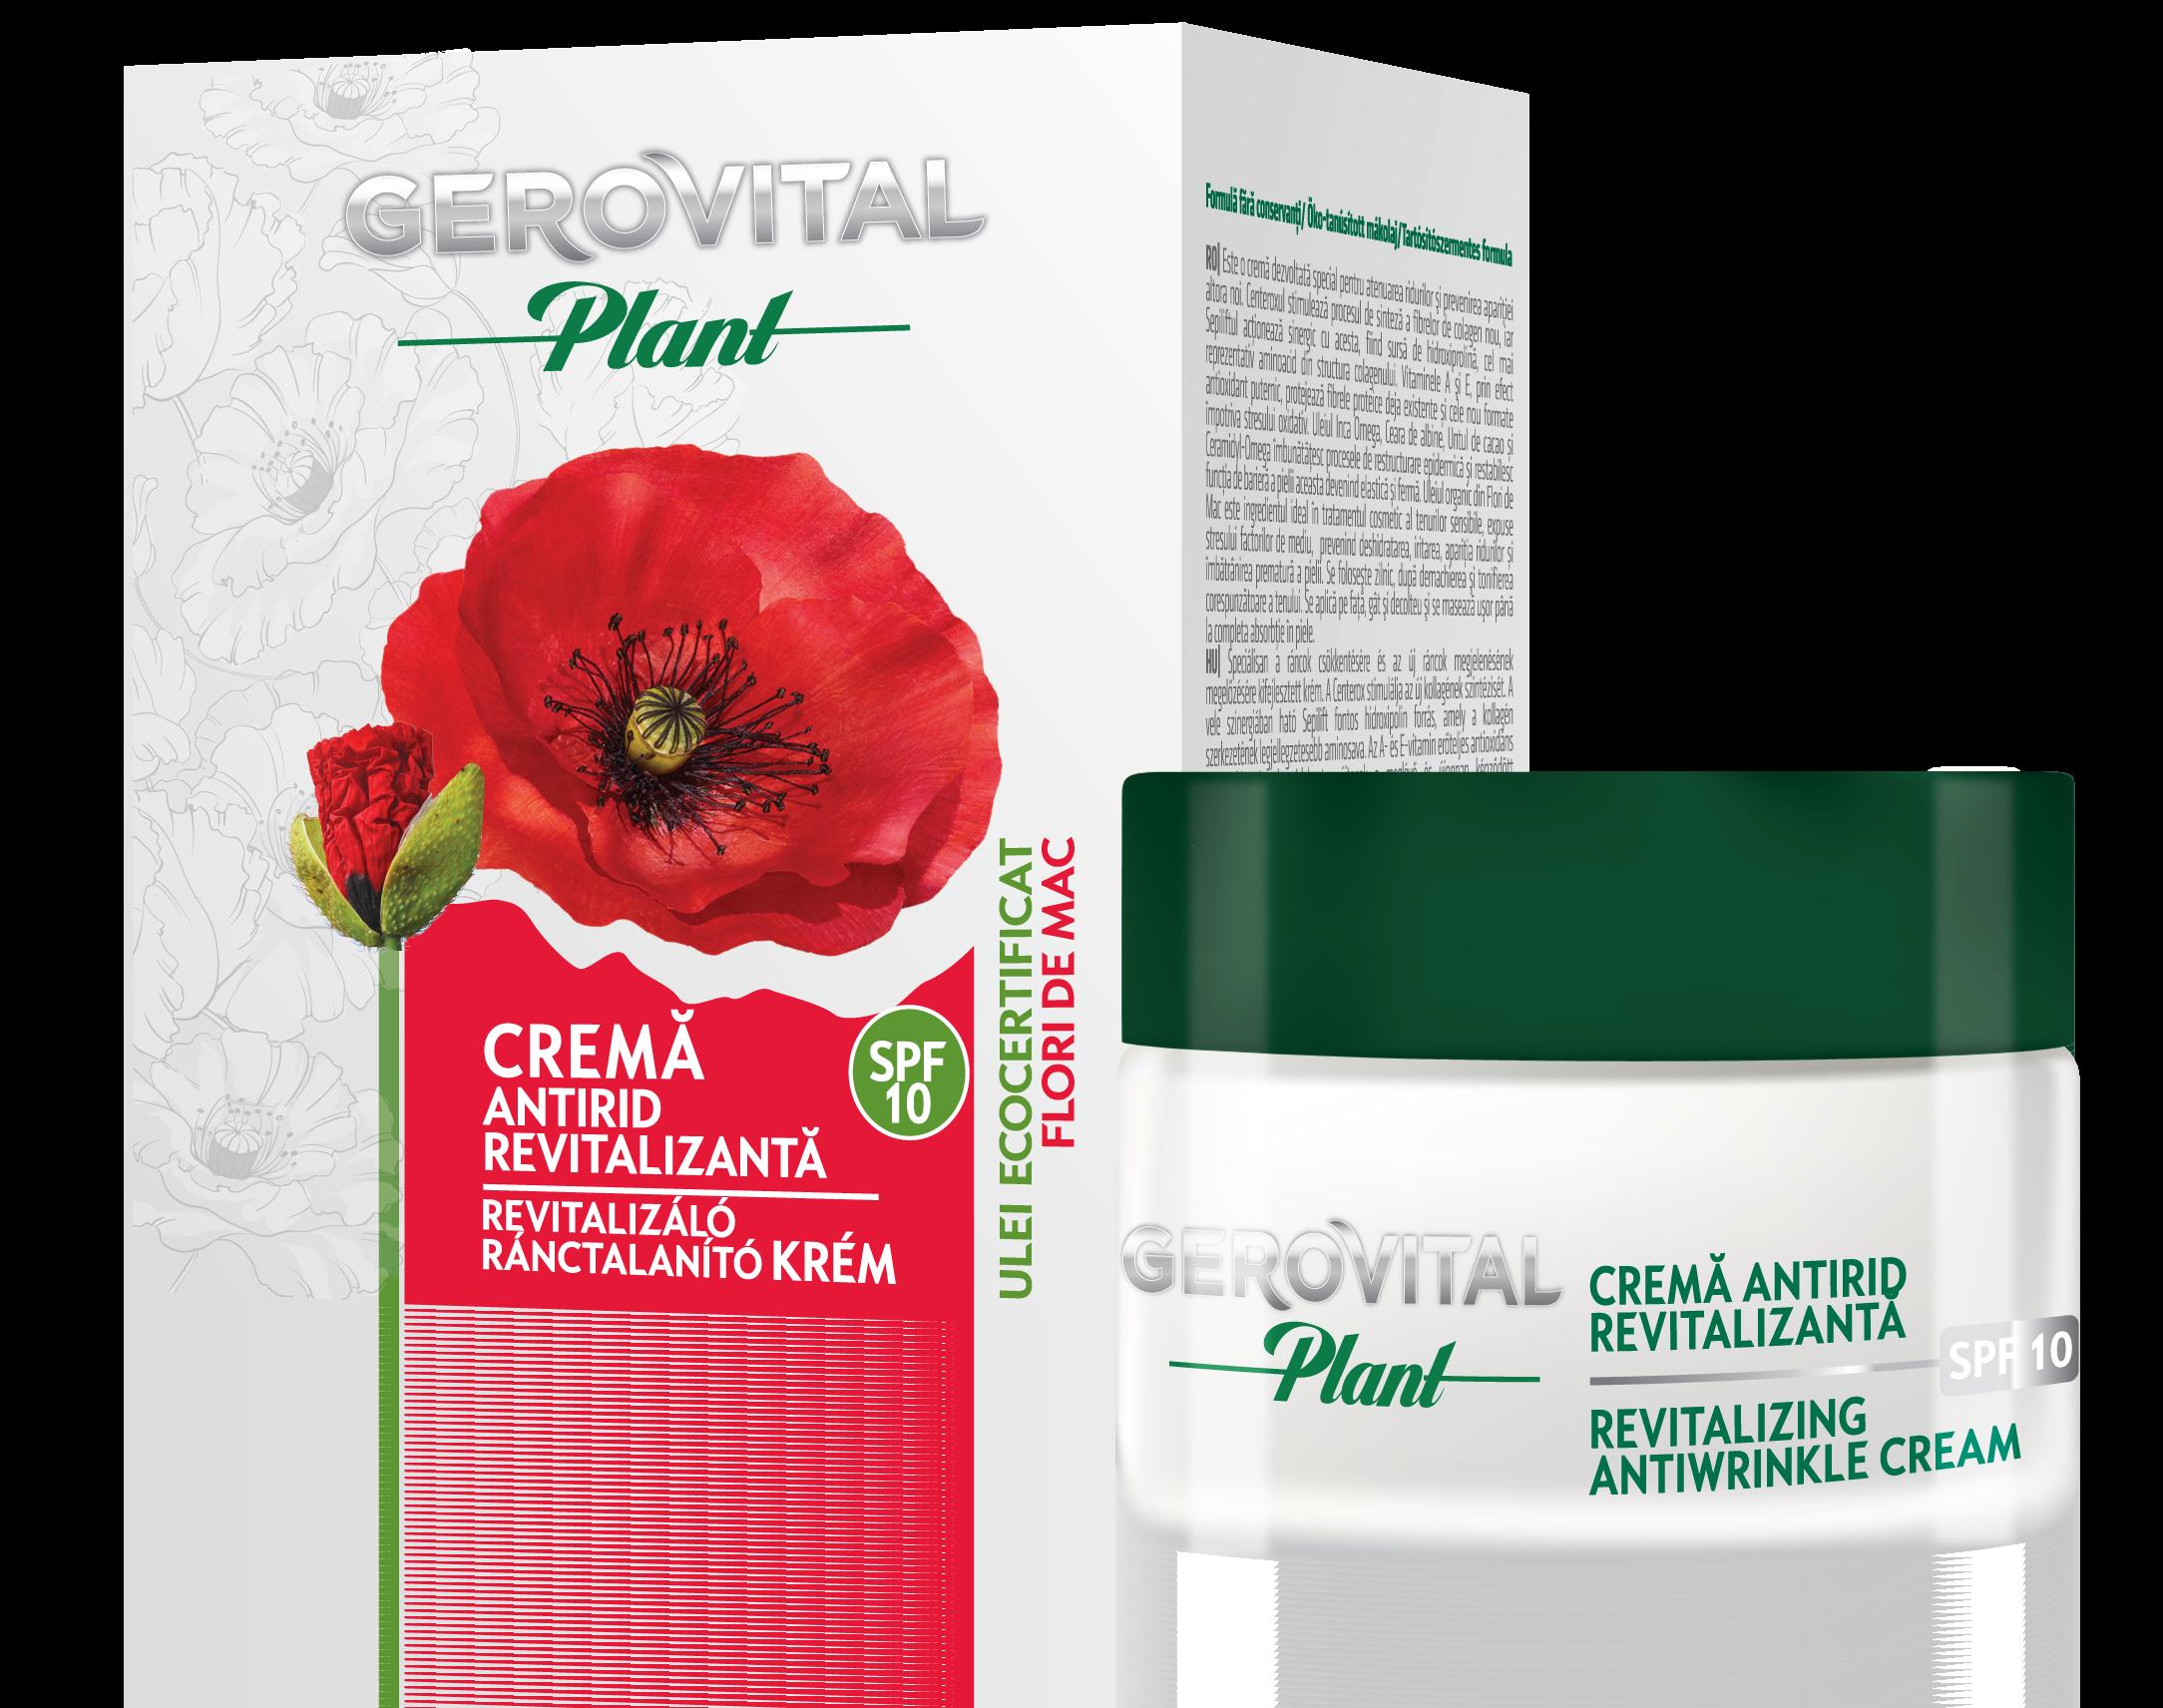 CREMA ANTIRID REVITALIZANTA SPF 10 - GEROVITAL PLANT 50 ml, Farmec